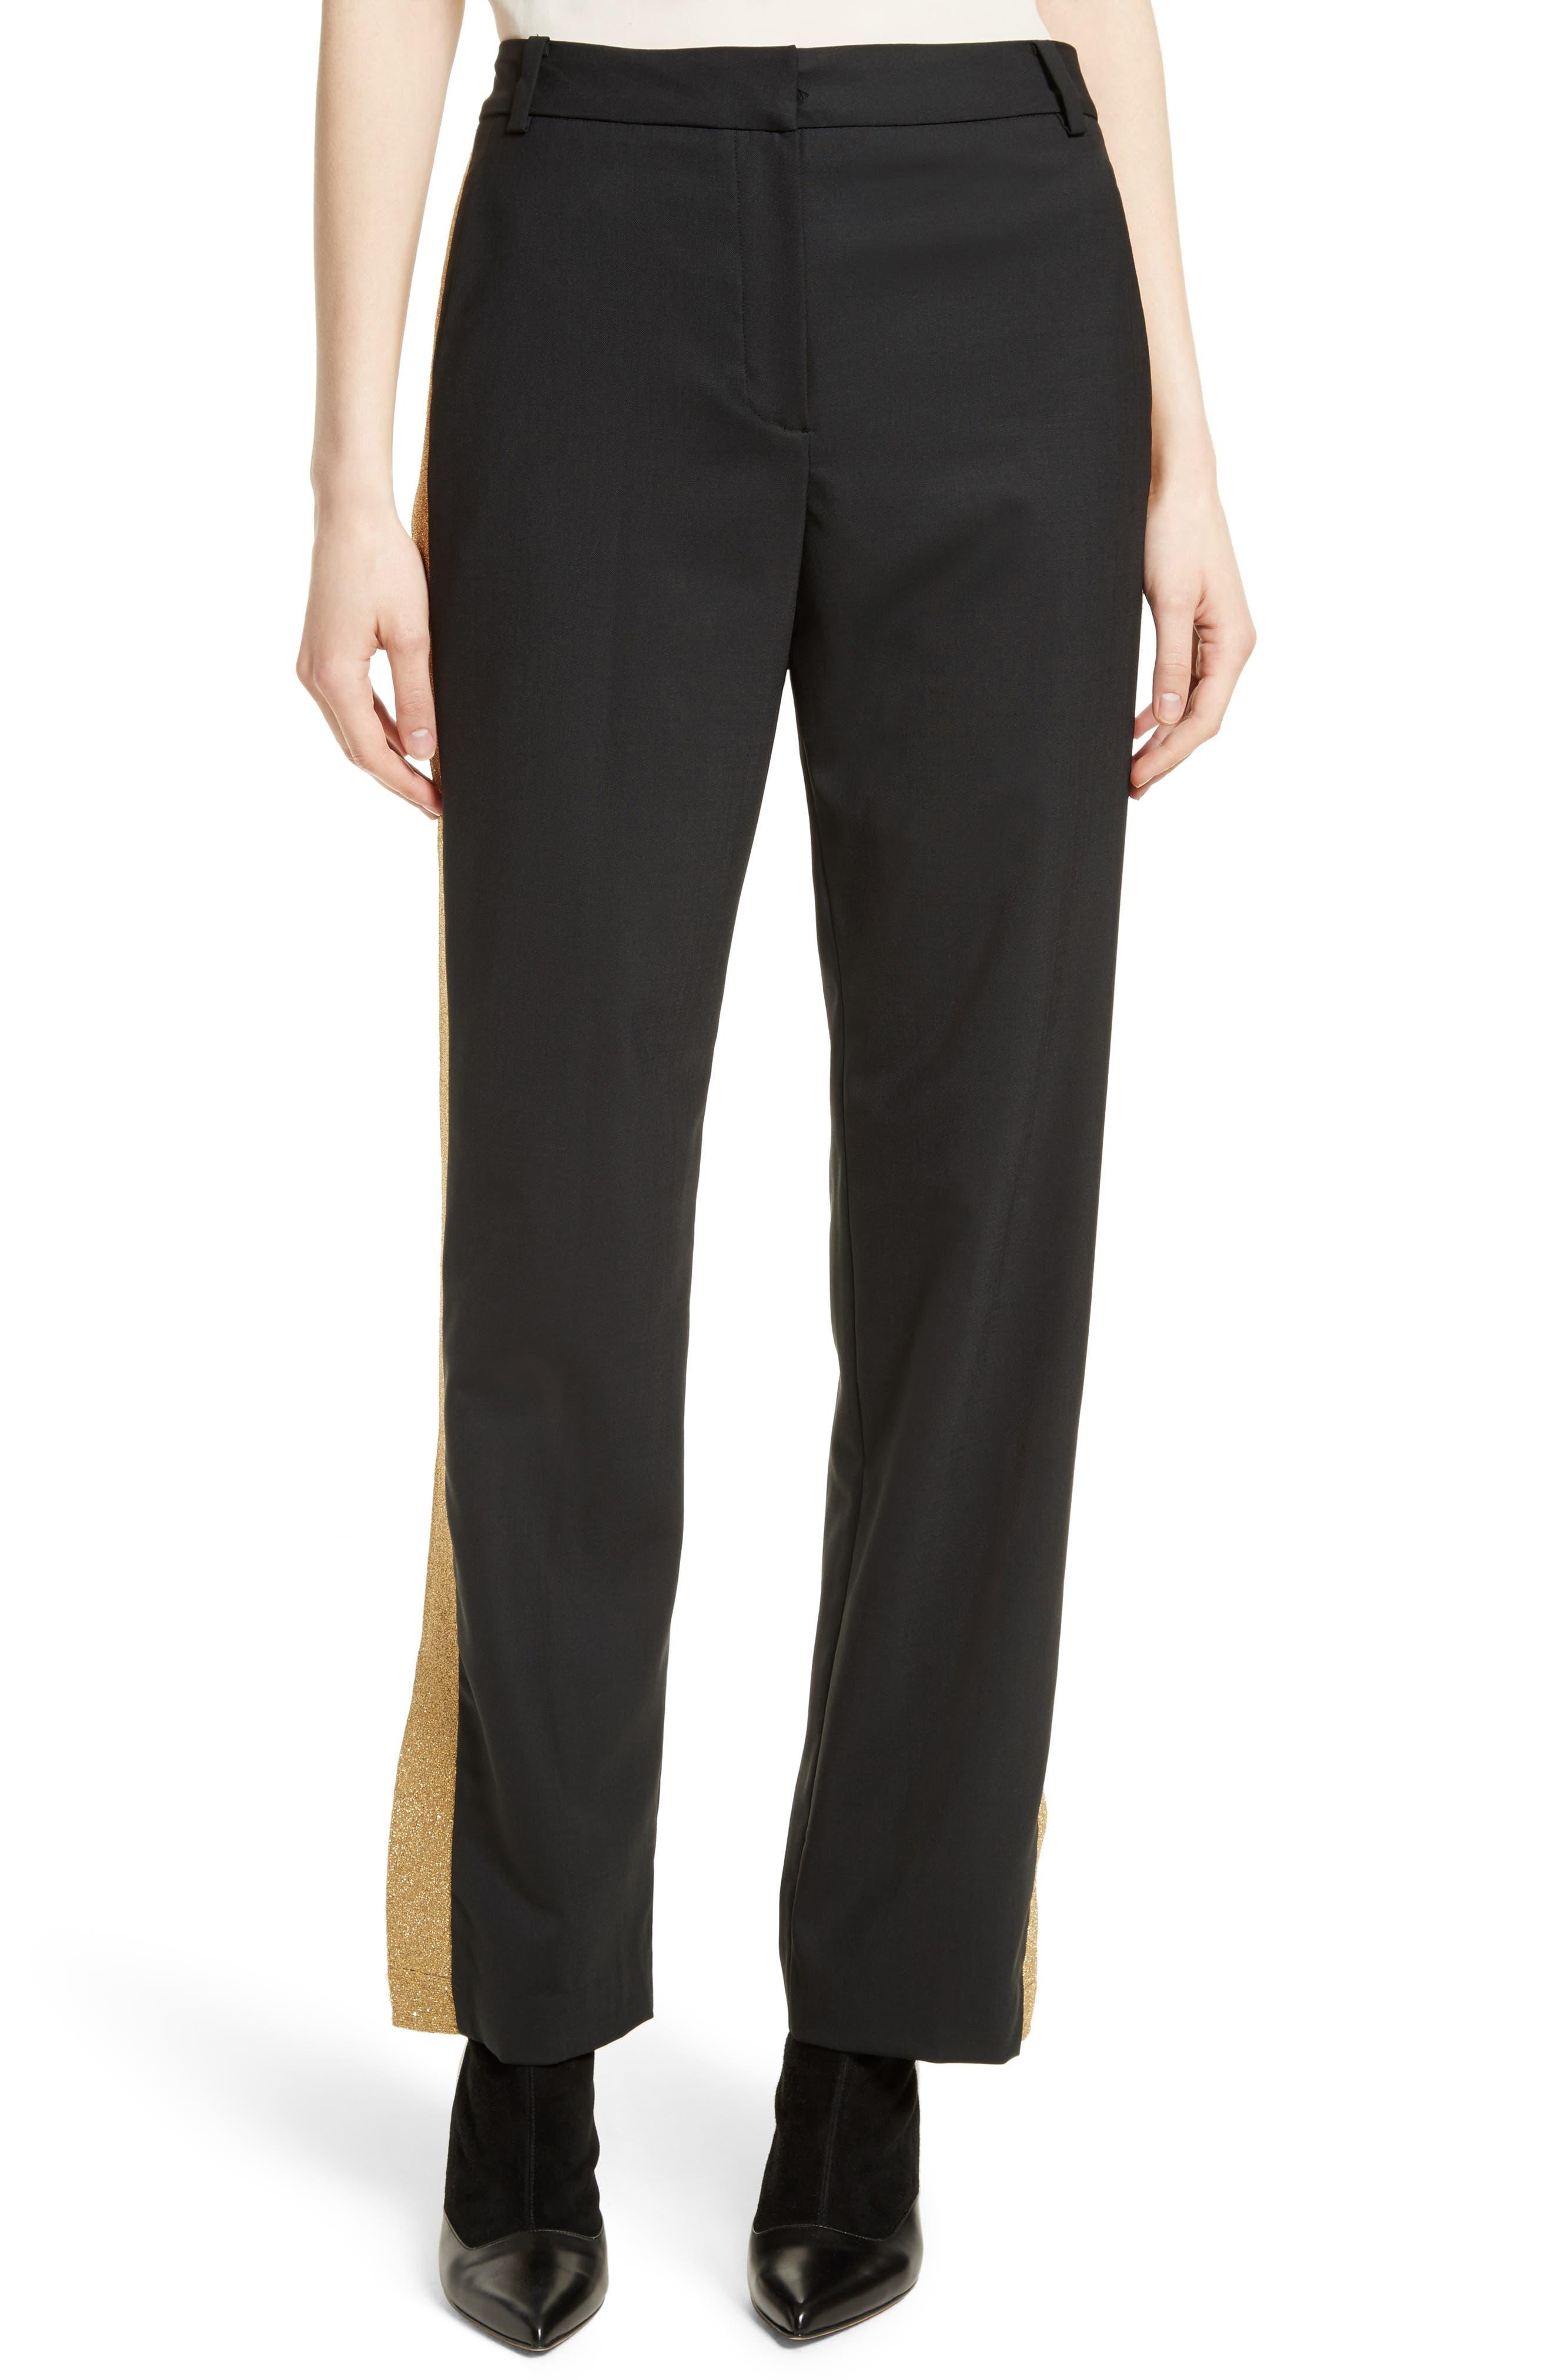 Main Image - Tibi Tropical Blend Tuxedo Pants